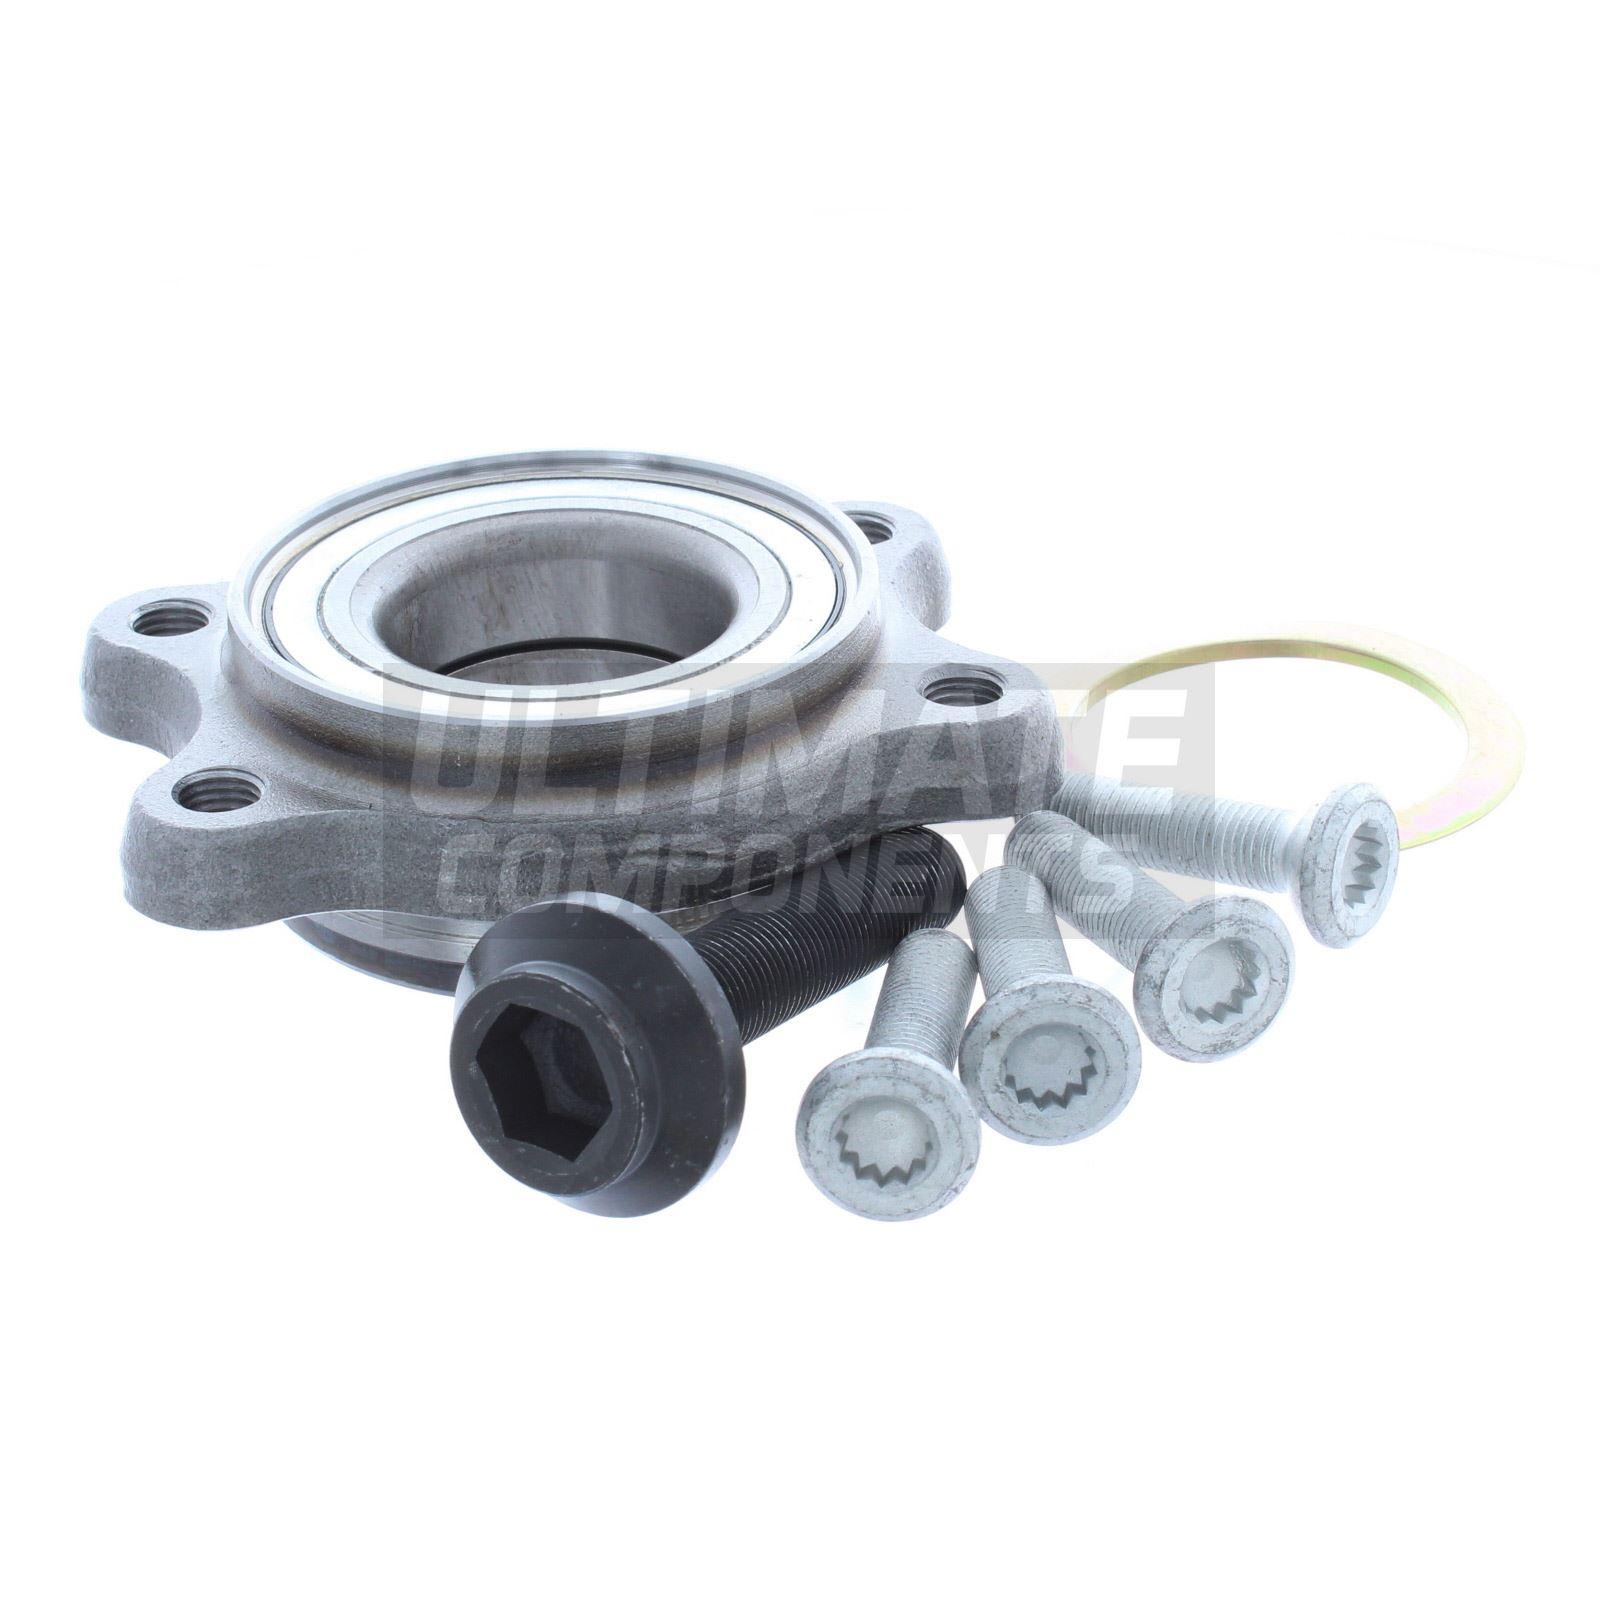 Volkswagen Phaeton Saloon 6//2003-5//2014 ABS Rear Wheel Hub Bearing Kits With ASB